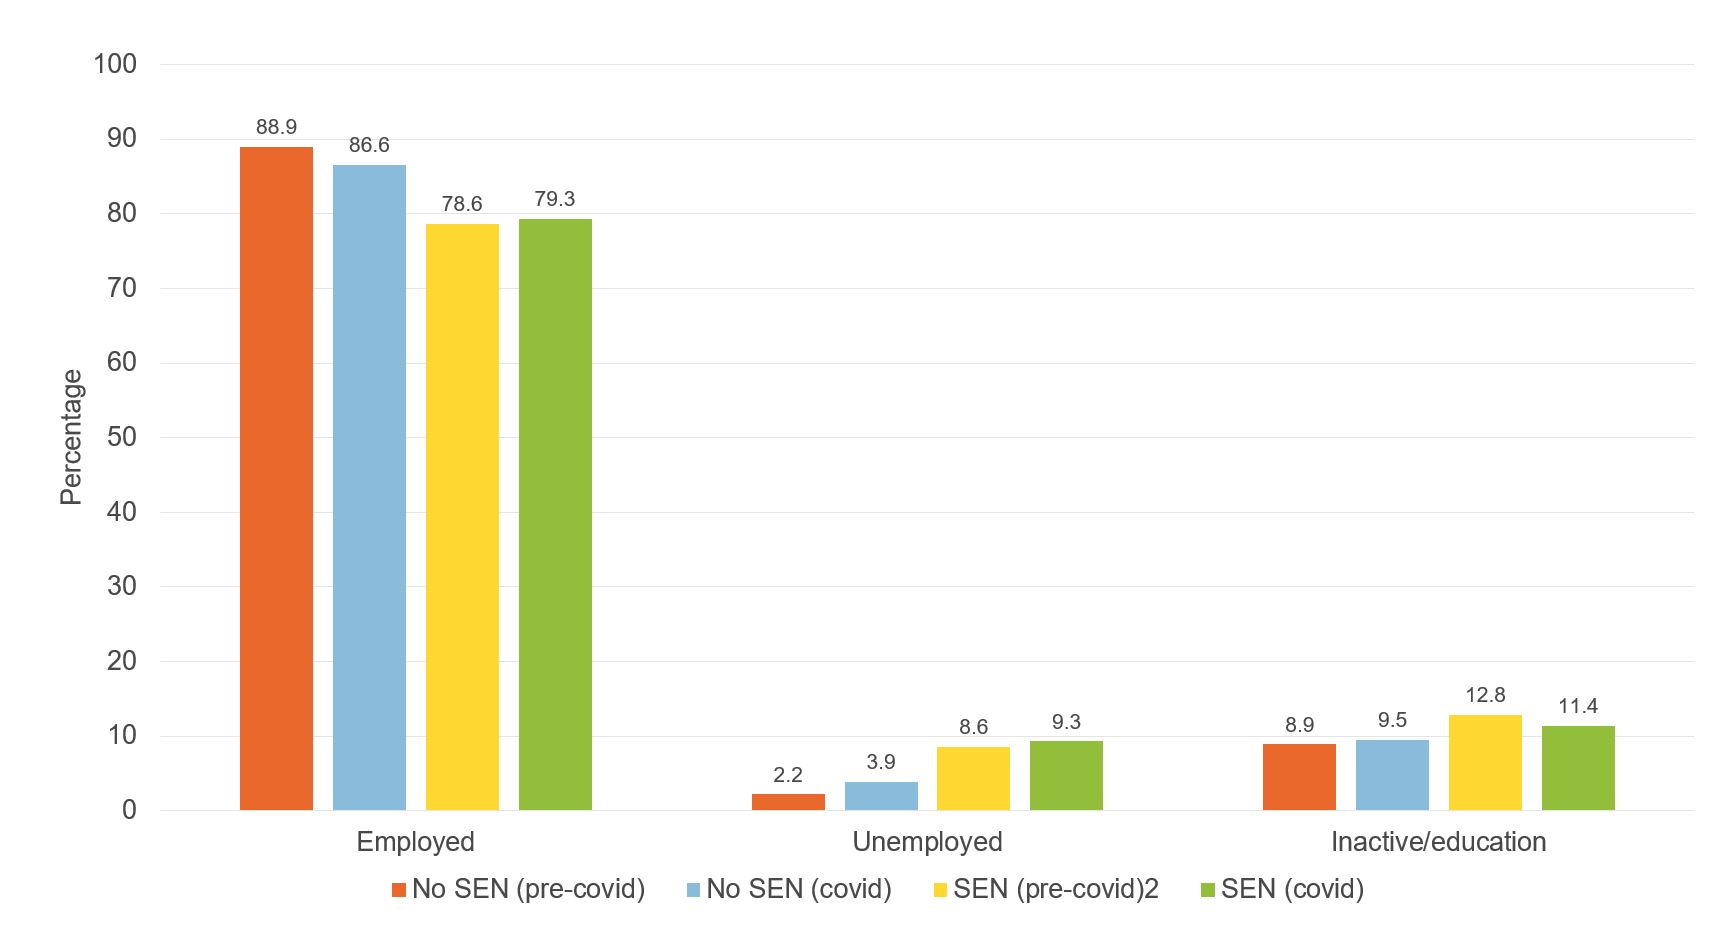 Figure showing economic activity by SEN status (aged around 30)